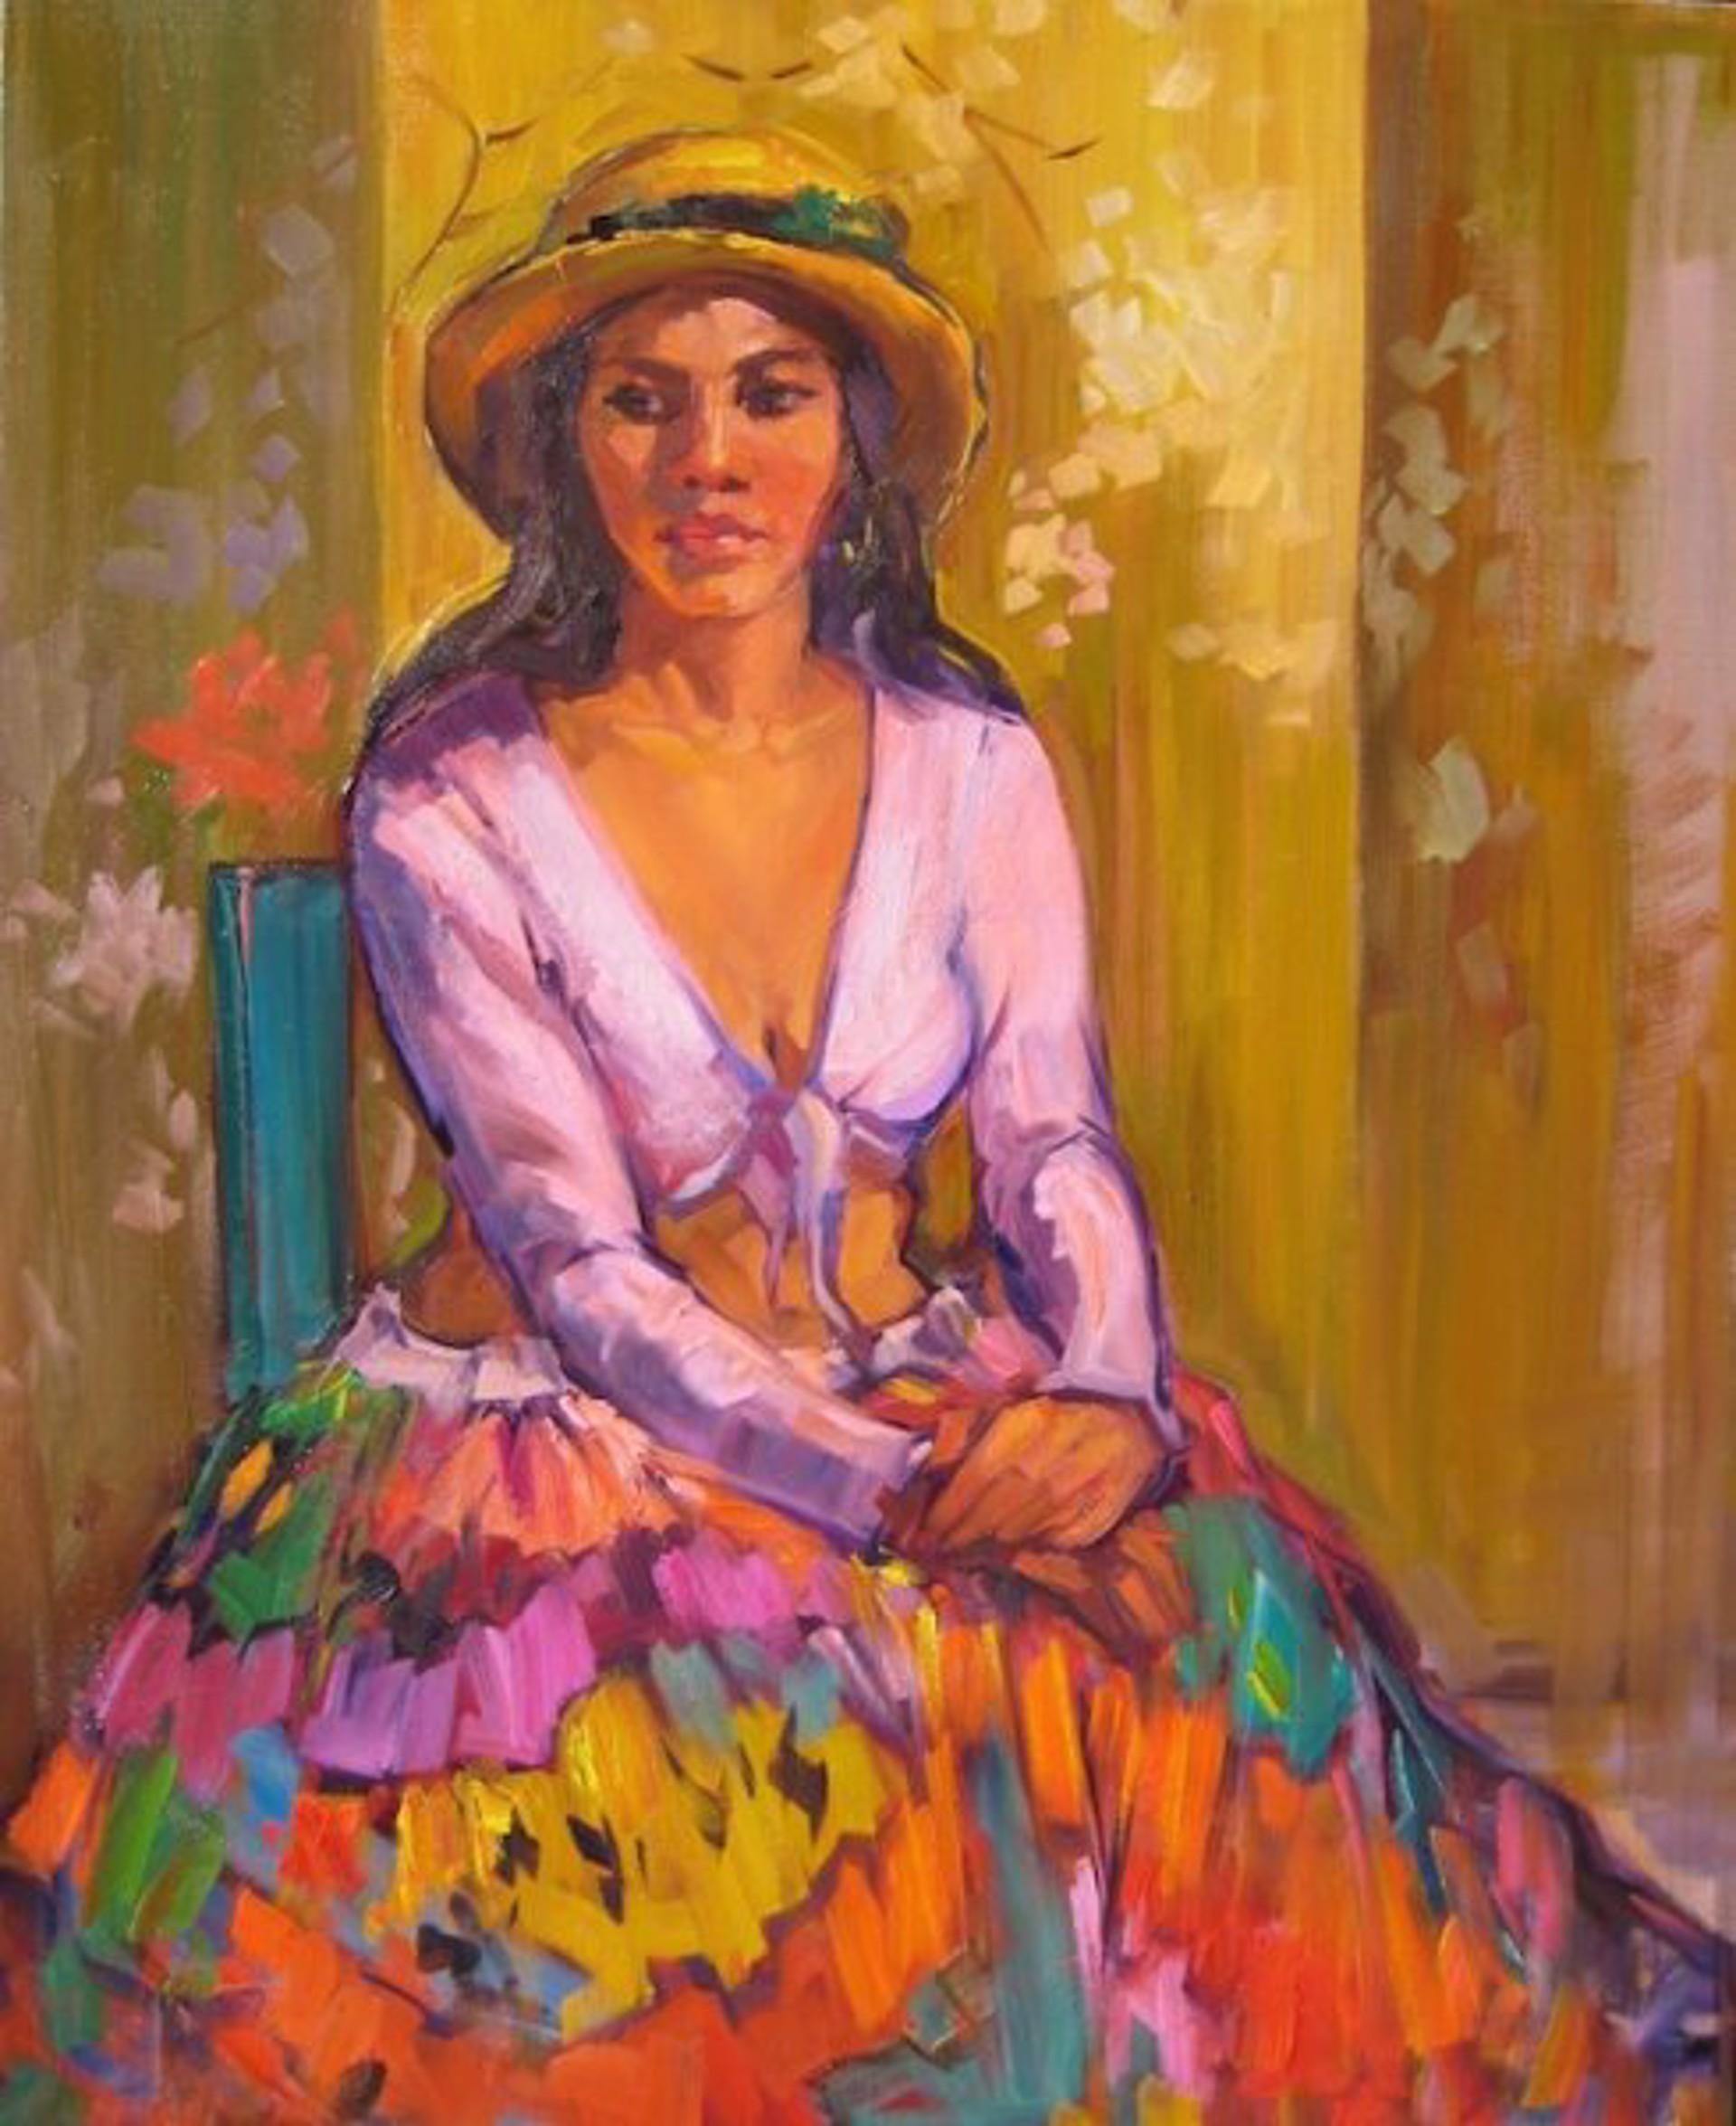 Maria Bertran: Girl With Straw Hat by Maria Bertrán